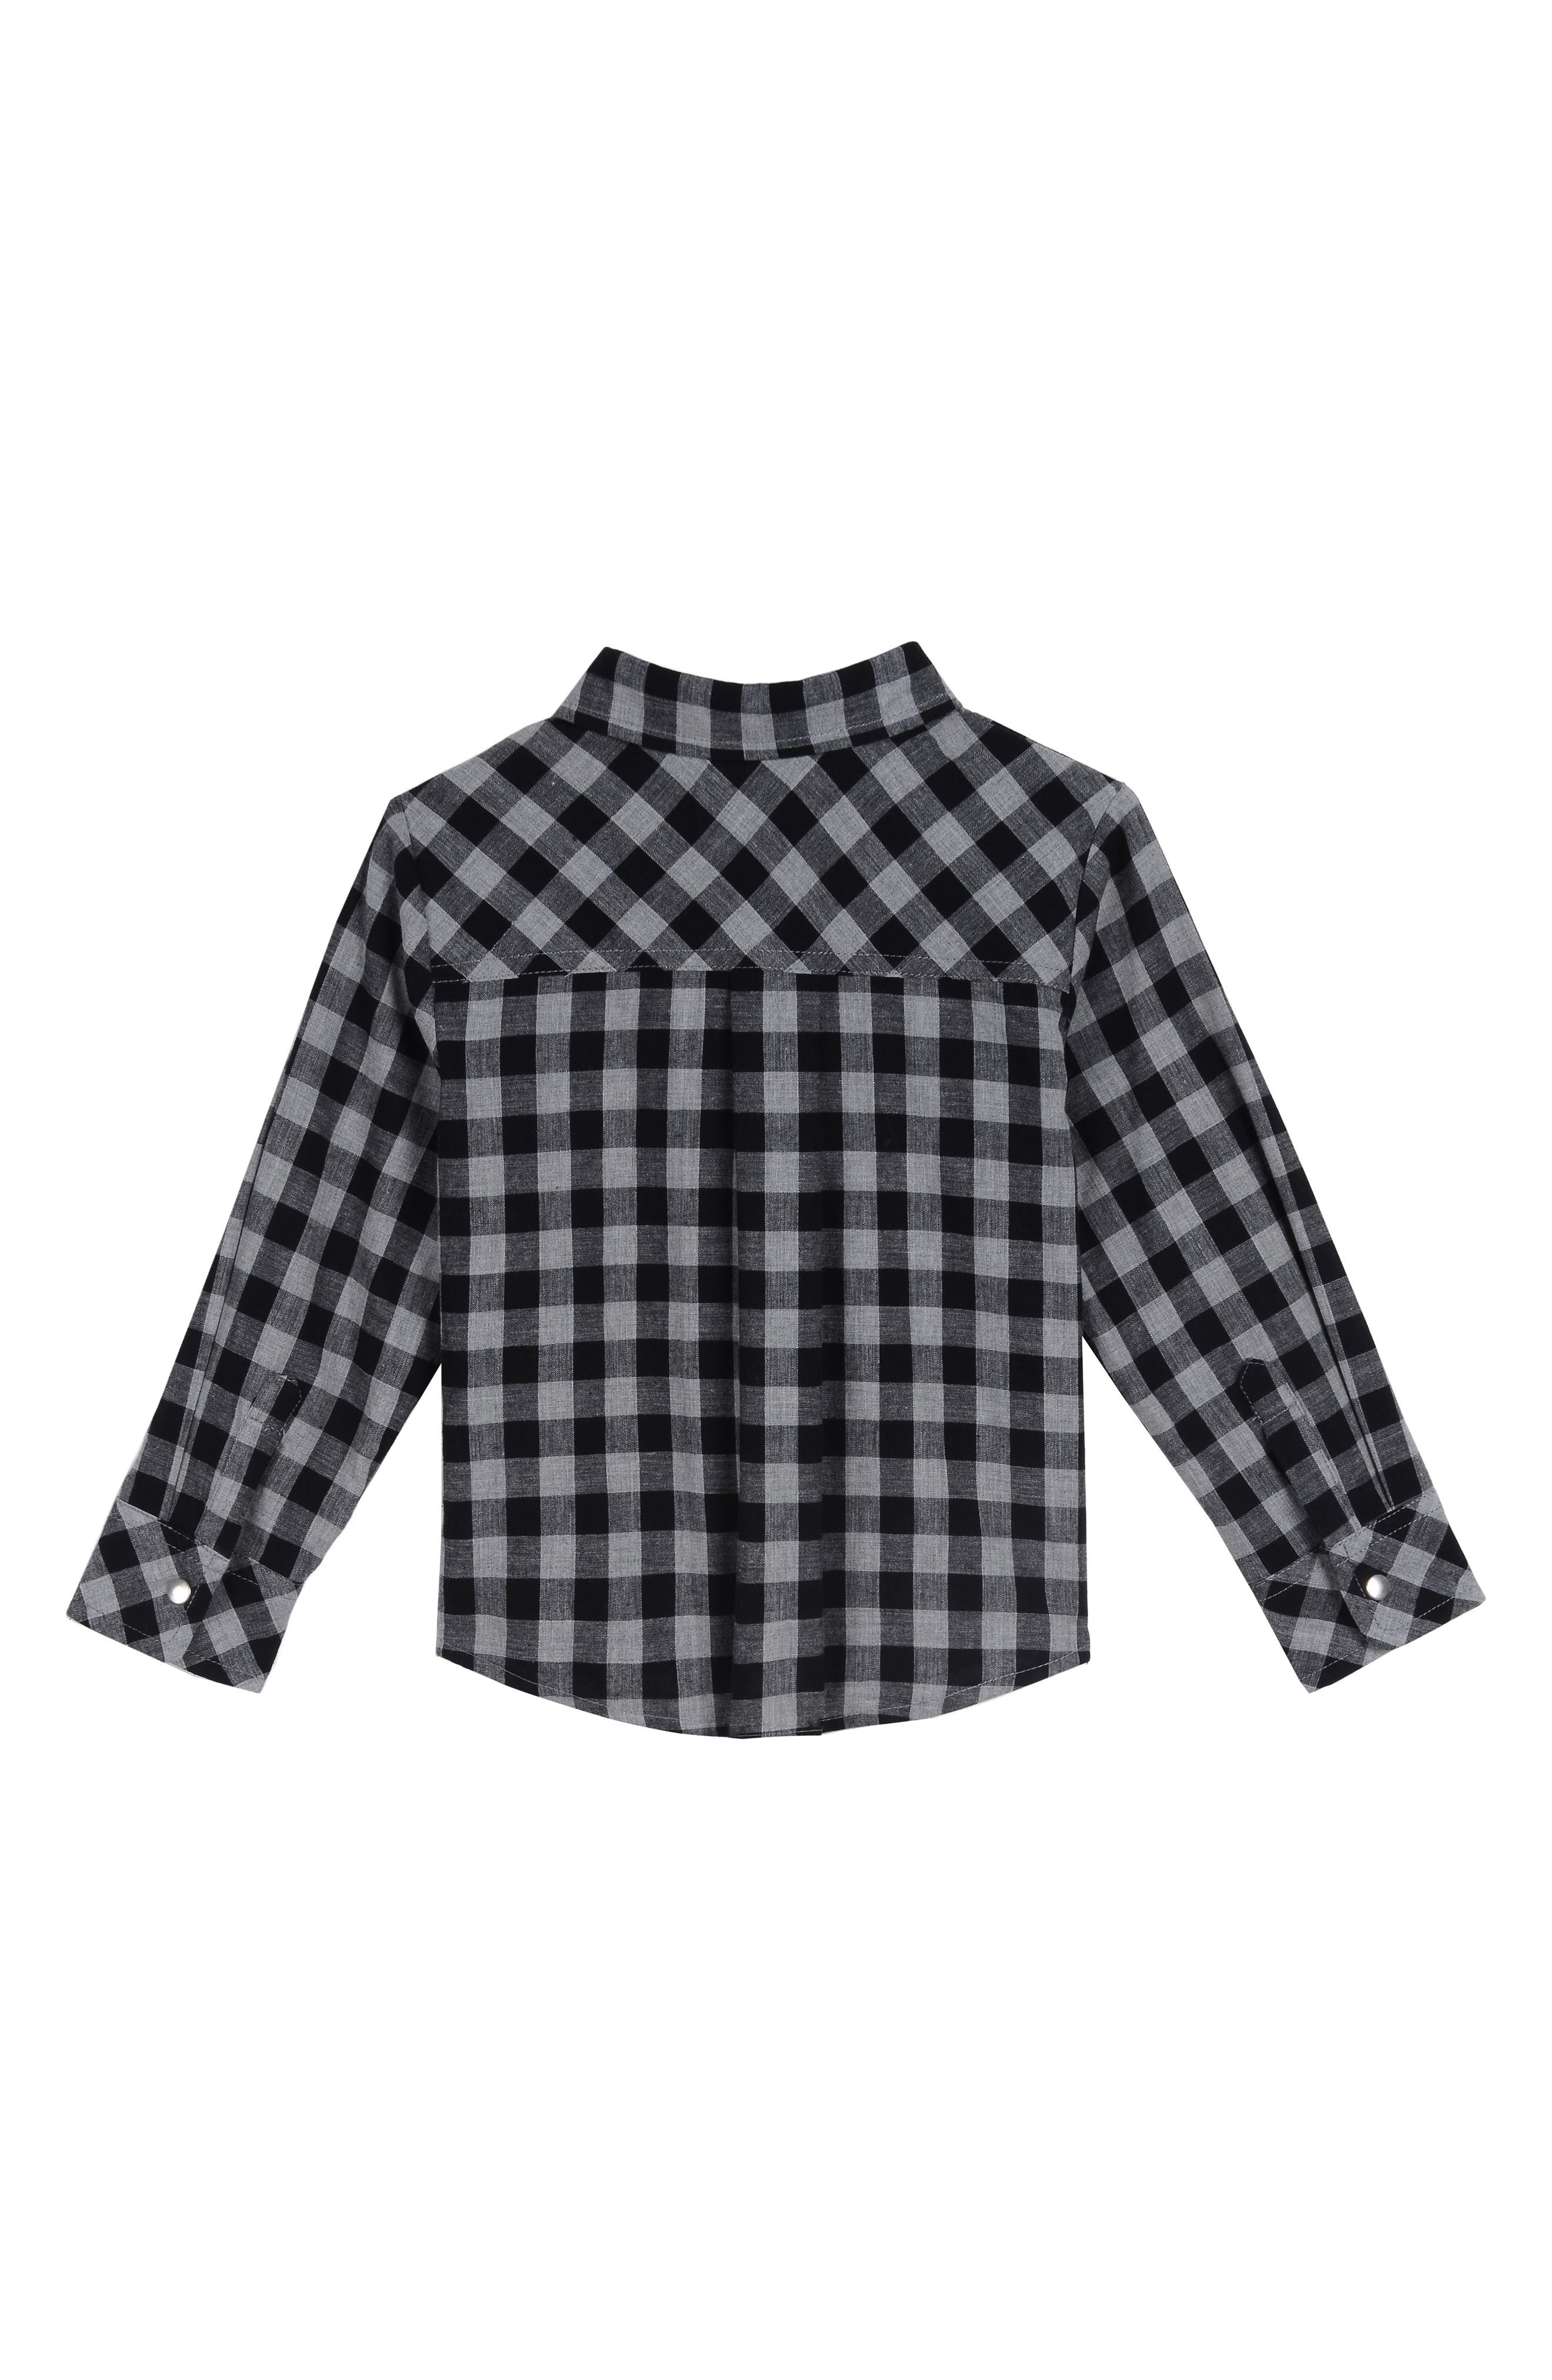 x Disney Plaid Shirt, T-Shirt & Pants Set,                             Alternate thumbnail 2, color,                             BLACK / GREY